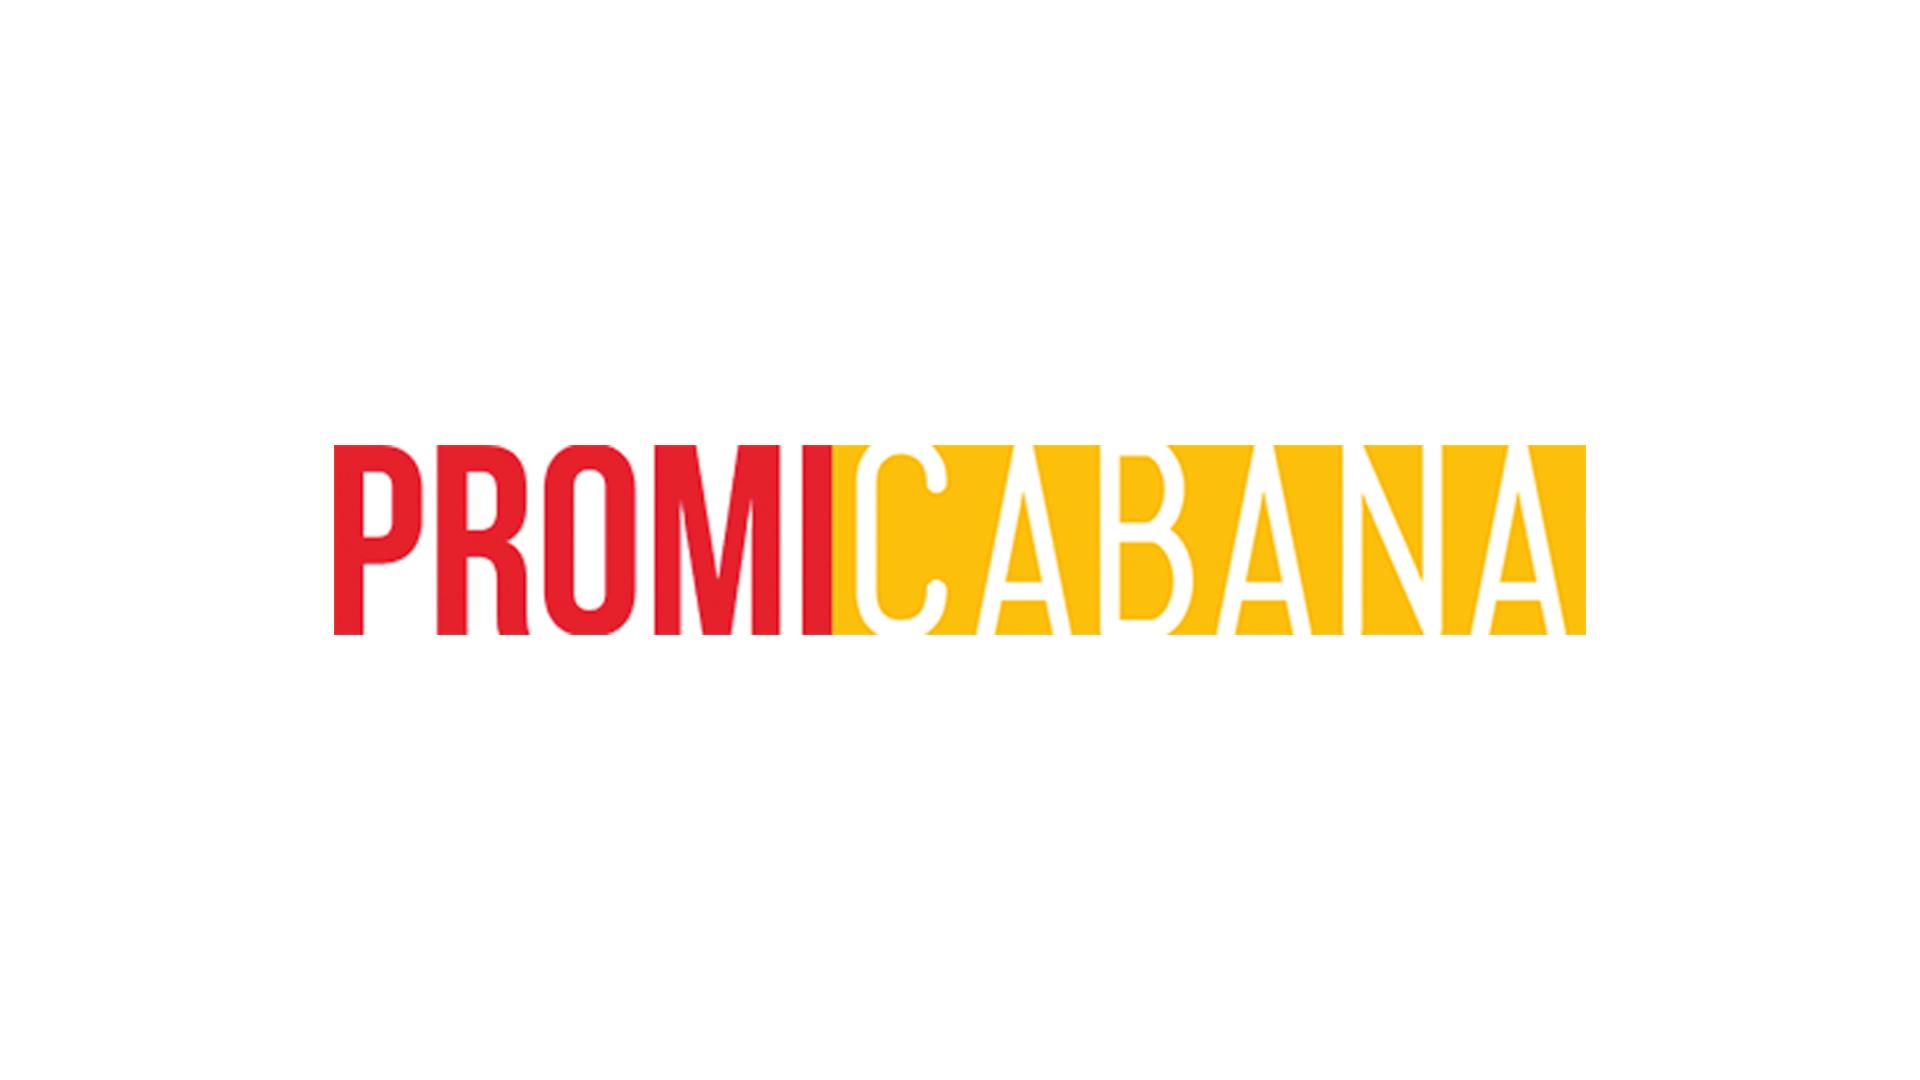 Miley-Cyrus-Wrecking-Ball-Musikvideo-3